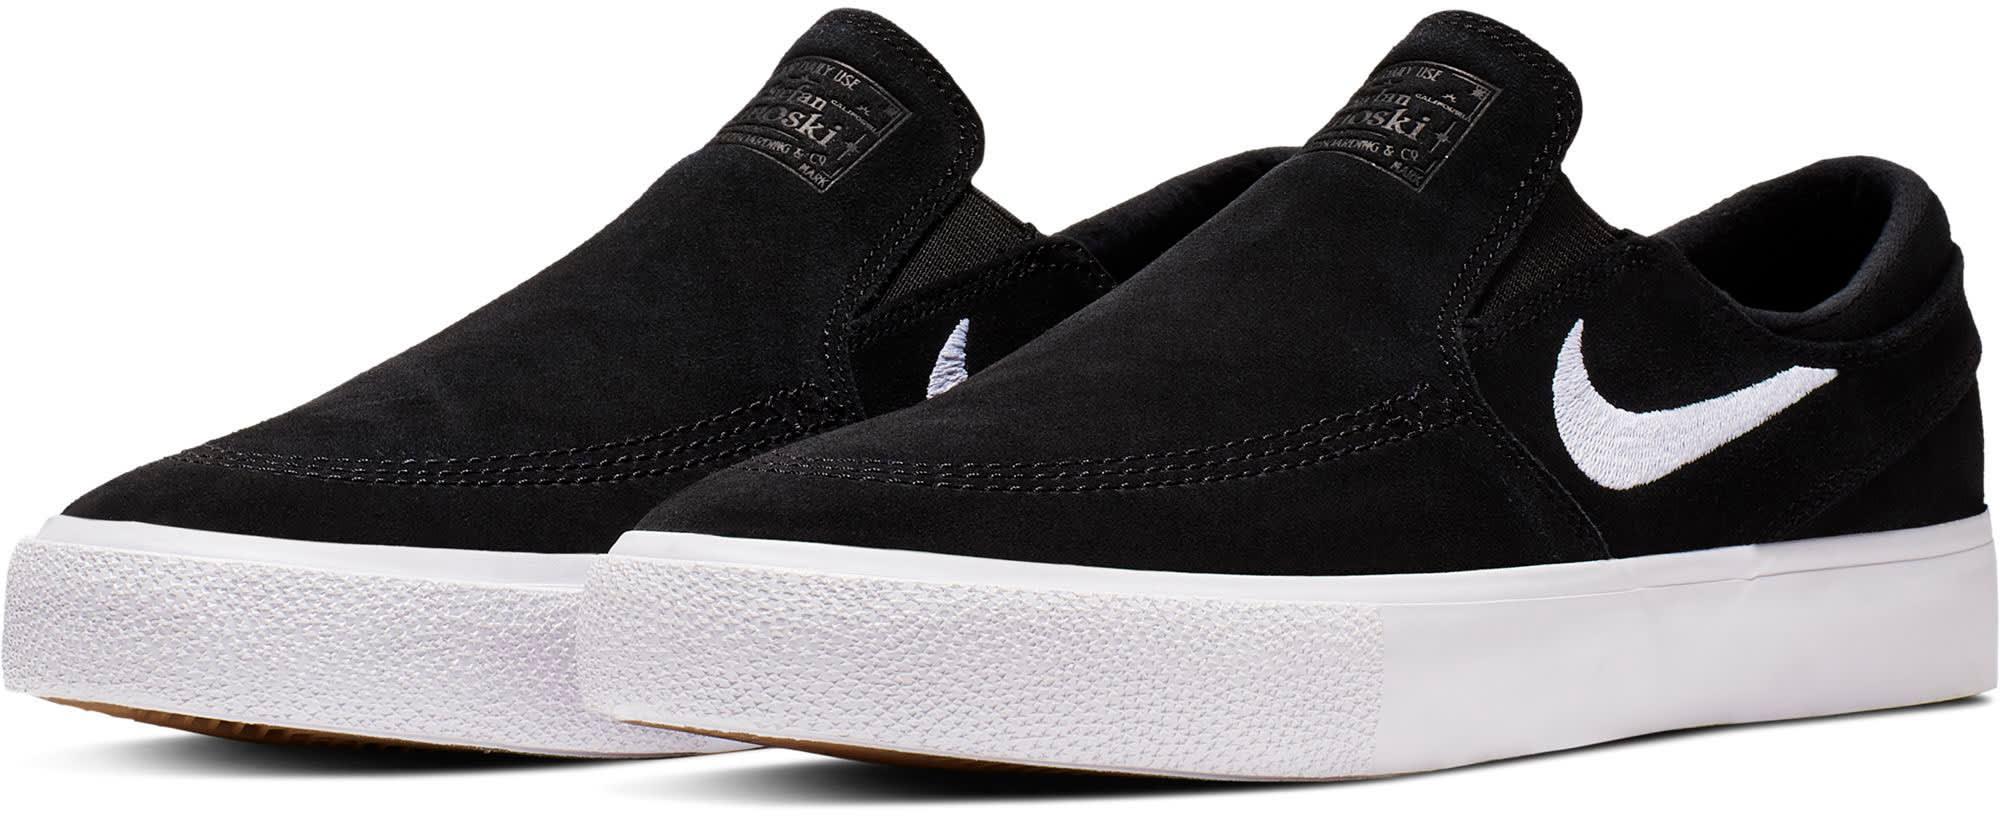 c6f709561b Nike SB Zoom Stefan Janoski Slip RM Skate Shoes - thumbnail 3